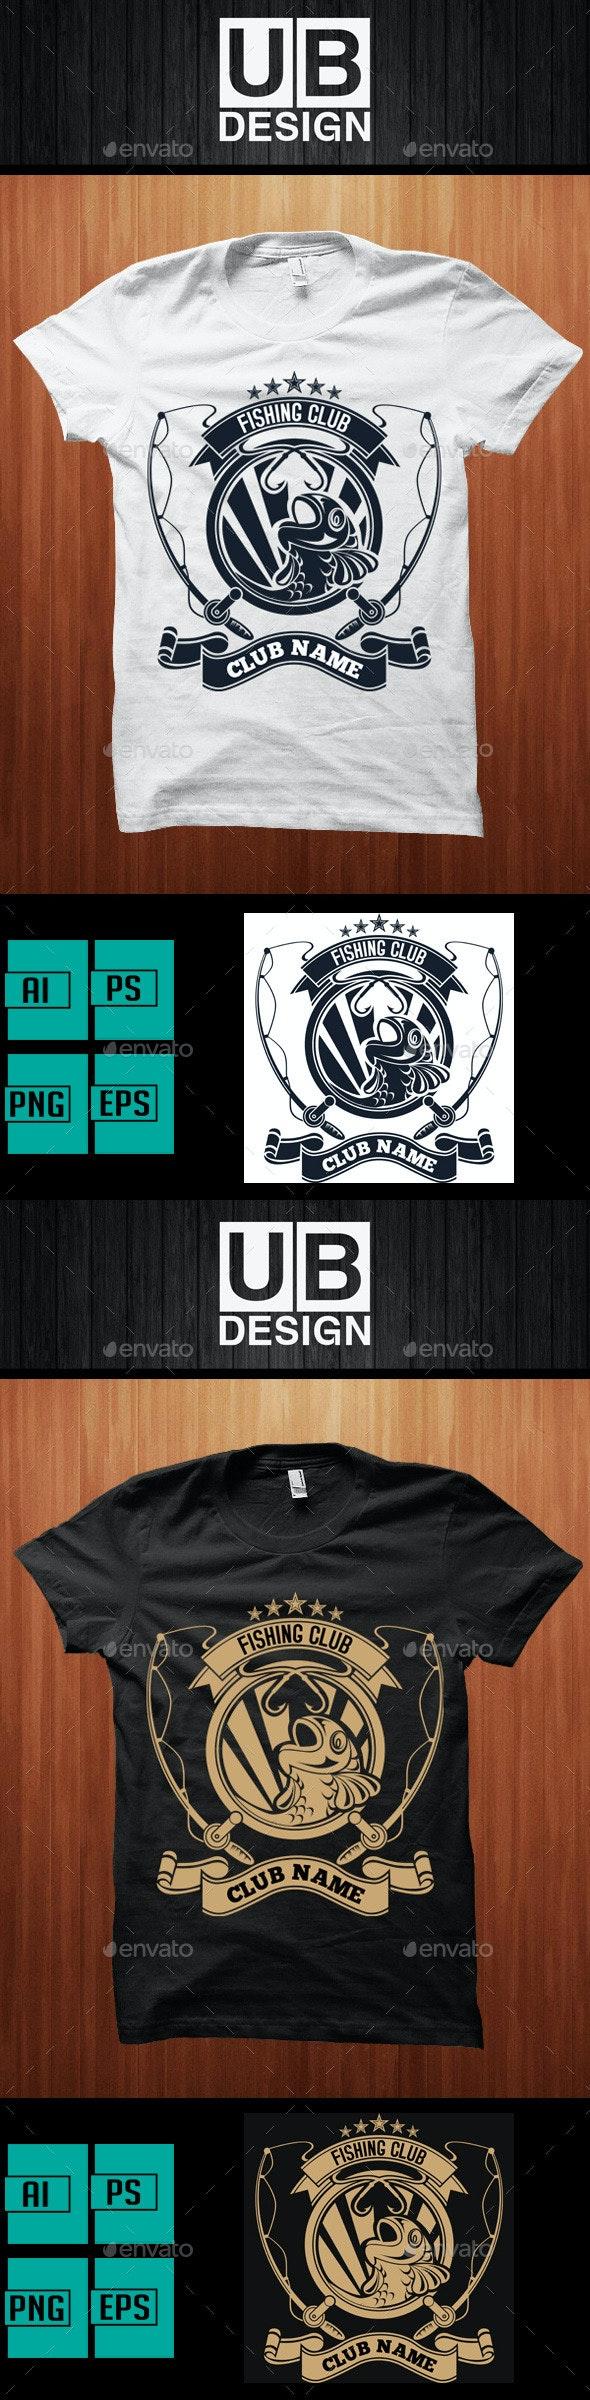 T-shirt Design for Fishing Club - Sports & Teams T-Shirts